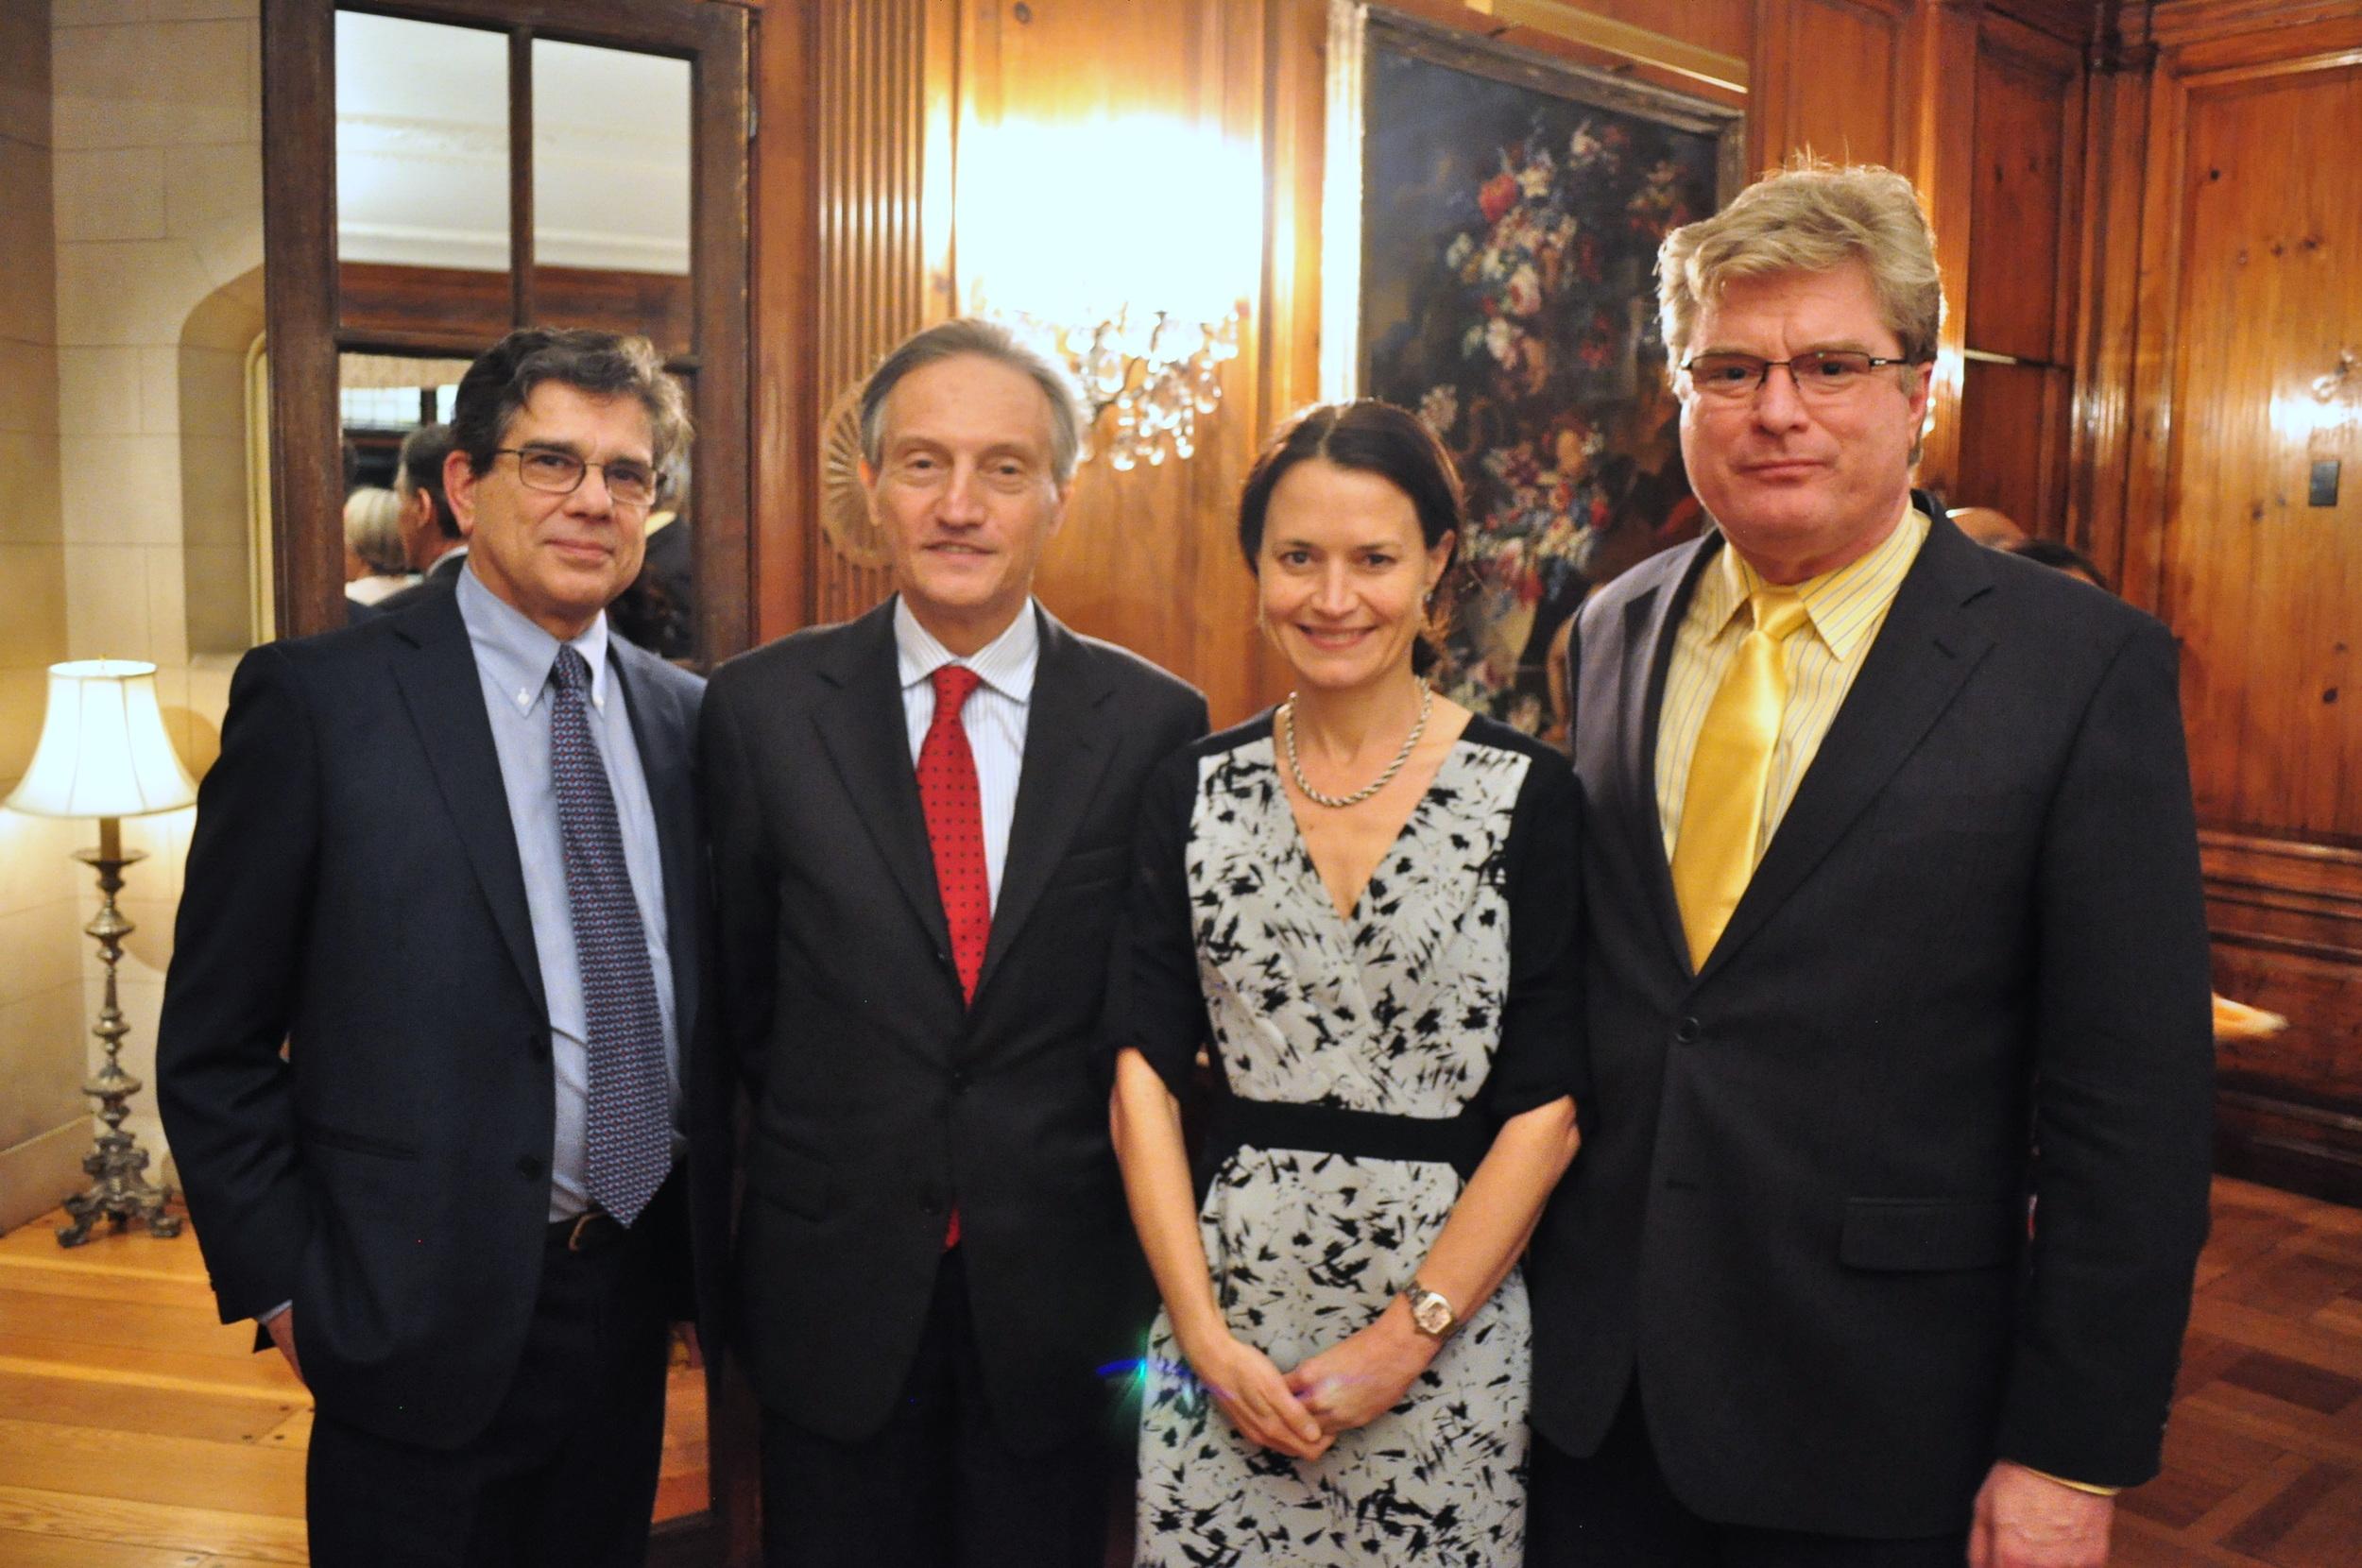 RI President Michel Gabaudan, Ambassador of Italy Claudio Bisogniero, Deputy Assistant Secretary Catherine Wiesner, and Principal Deputy Assistant Secretary Simon Henshaw.